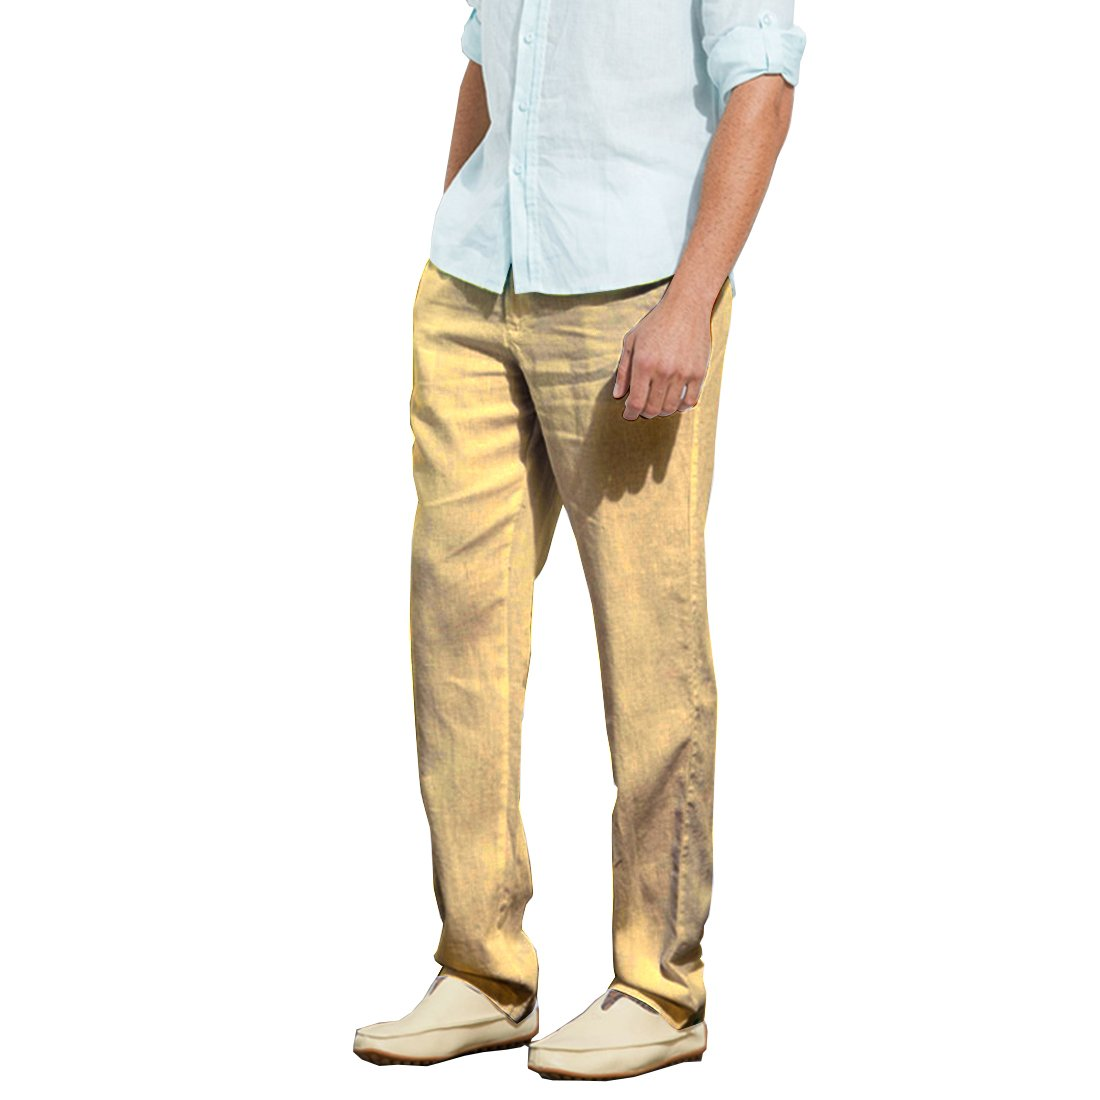 5550360c4c15 Manwan walk Men s Casual Beach Trousers Elastic Loose Fit Lightweight Linen  Summer Pants K70 (Medium